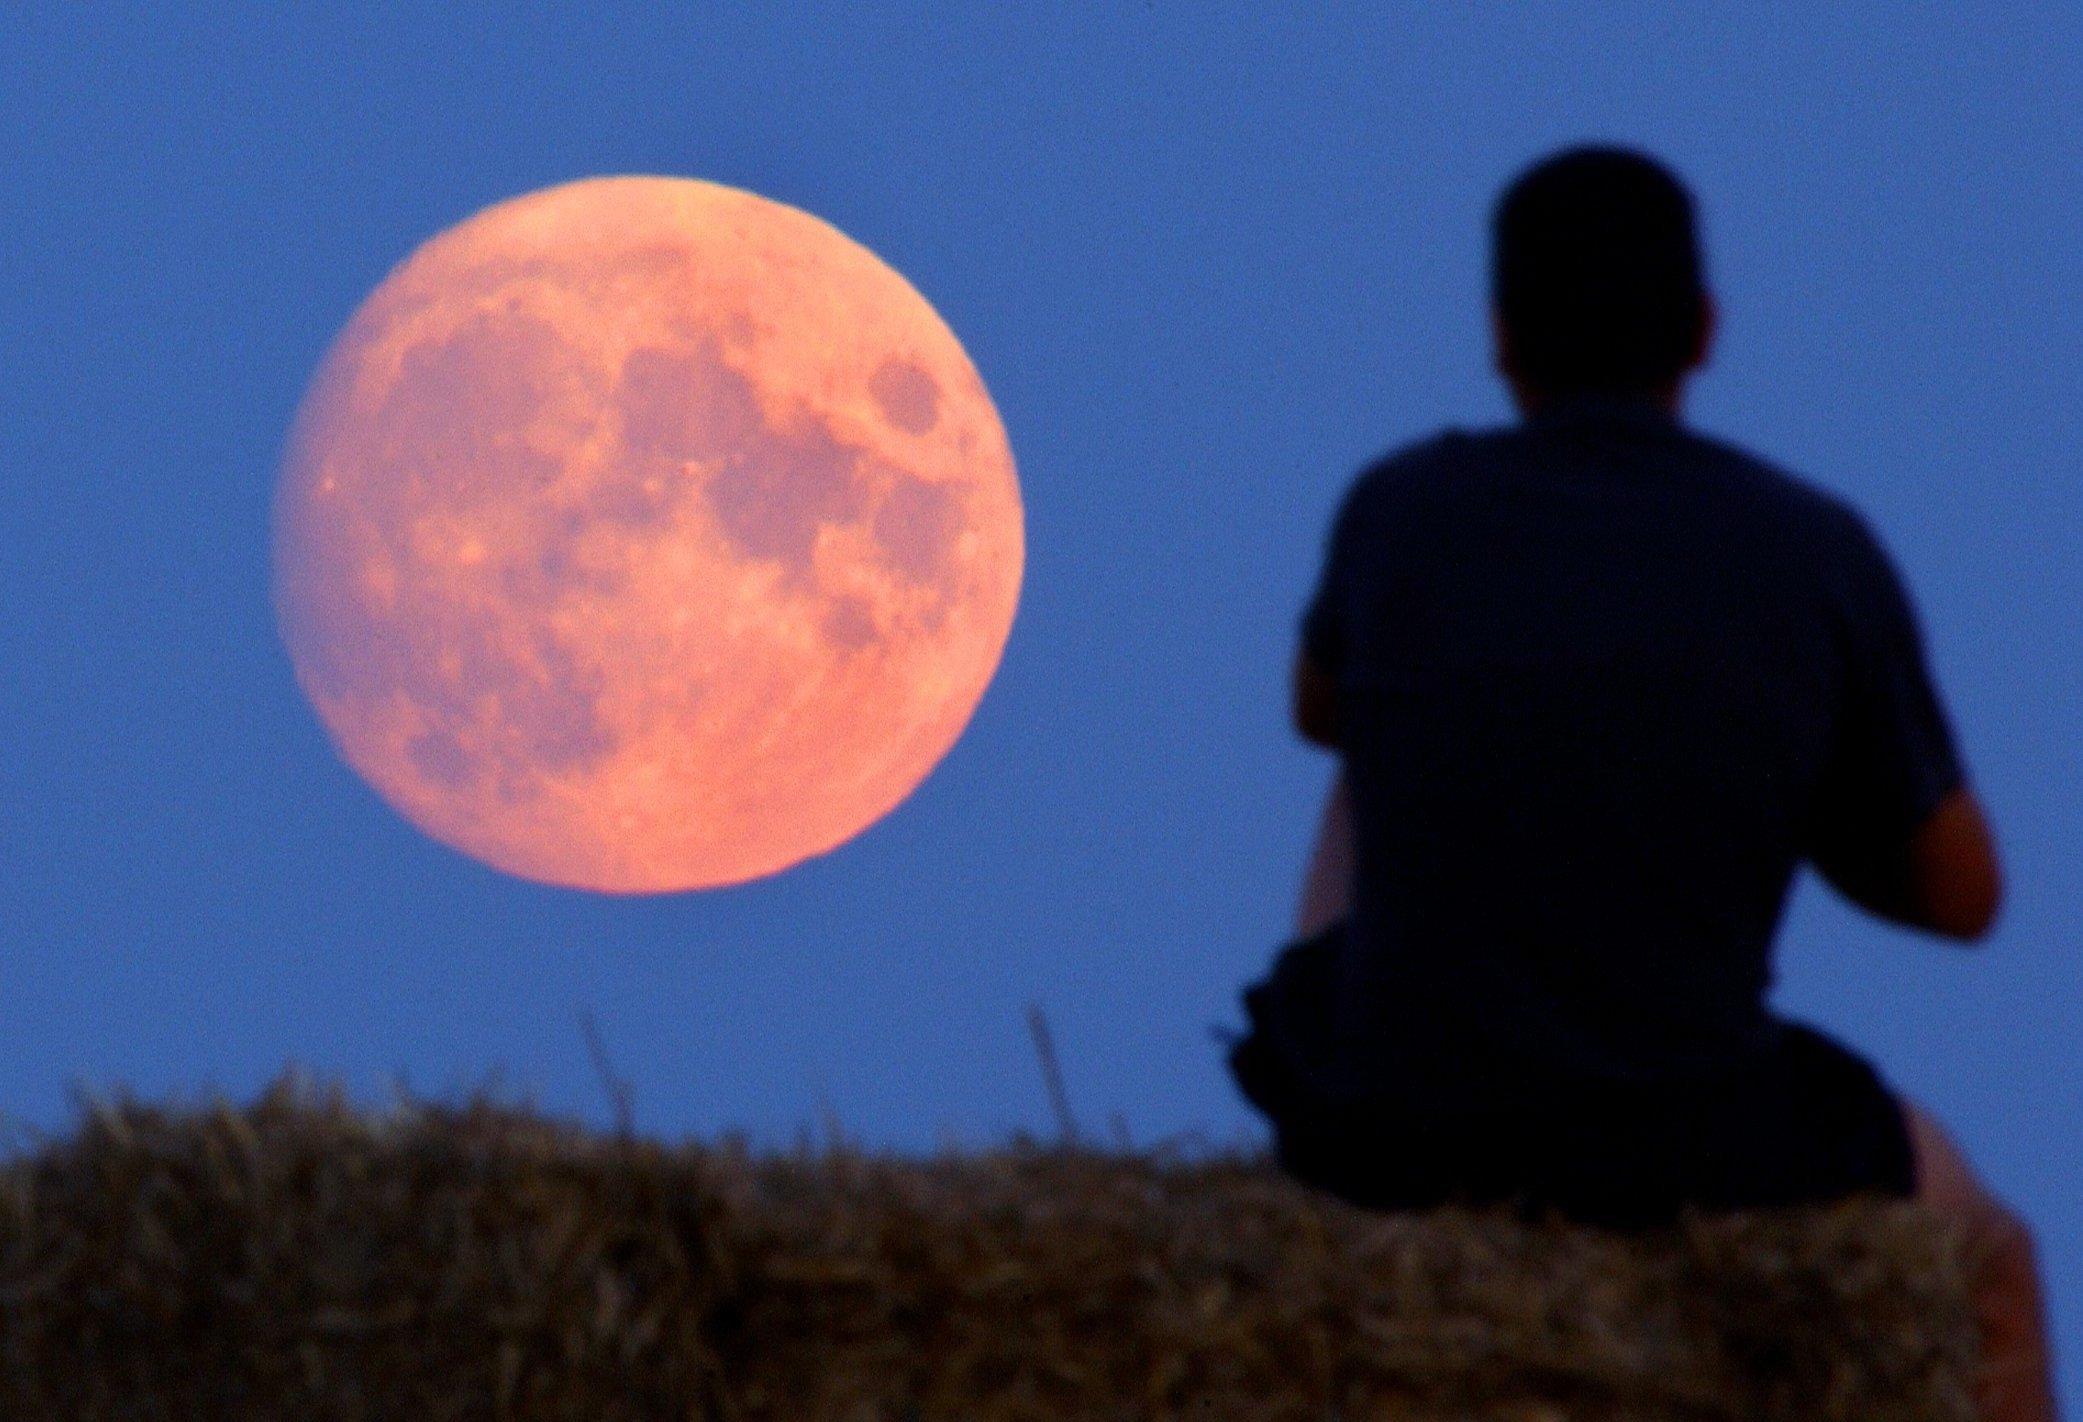 rot leuchtender Vollmond am Horizont